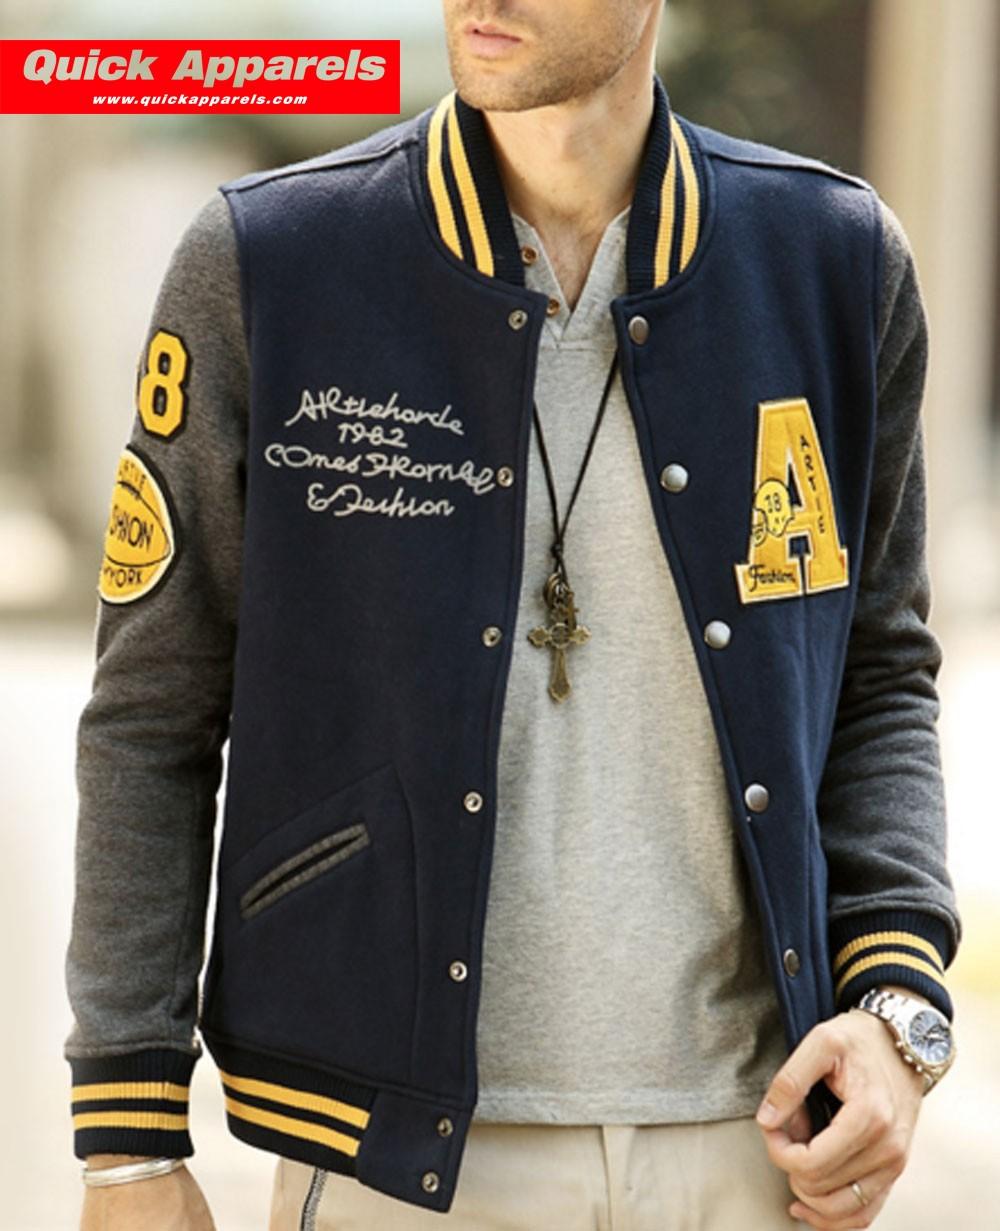 Remix: Style The Denim Jacket